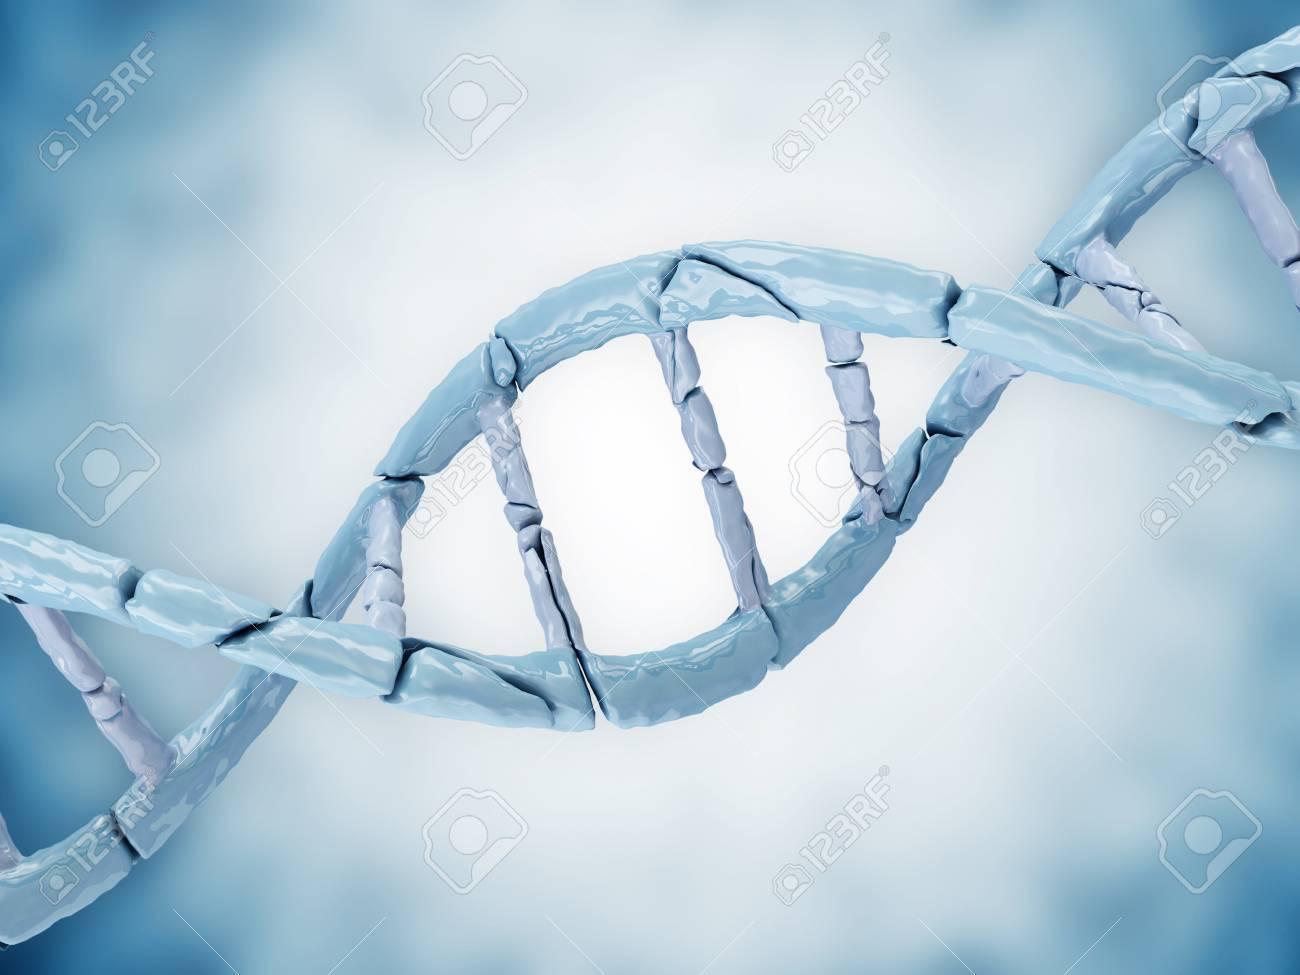 Digital illustration of a Broken DNA on blue background Stock Photo - 20084510